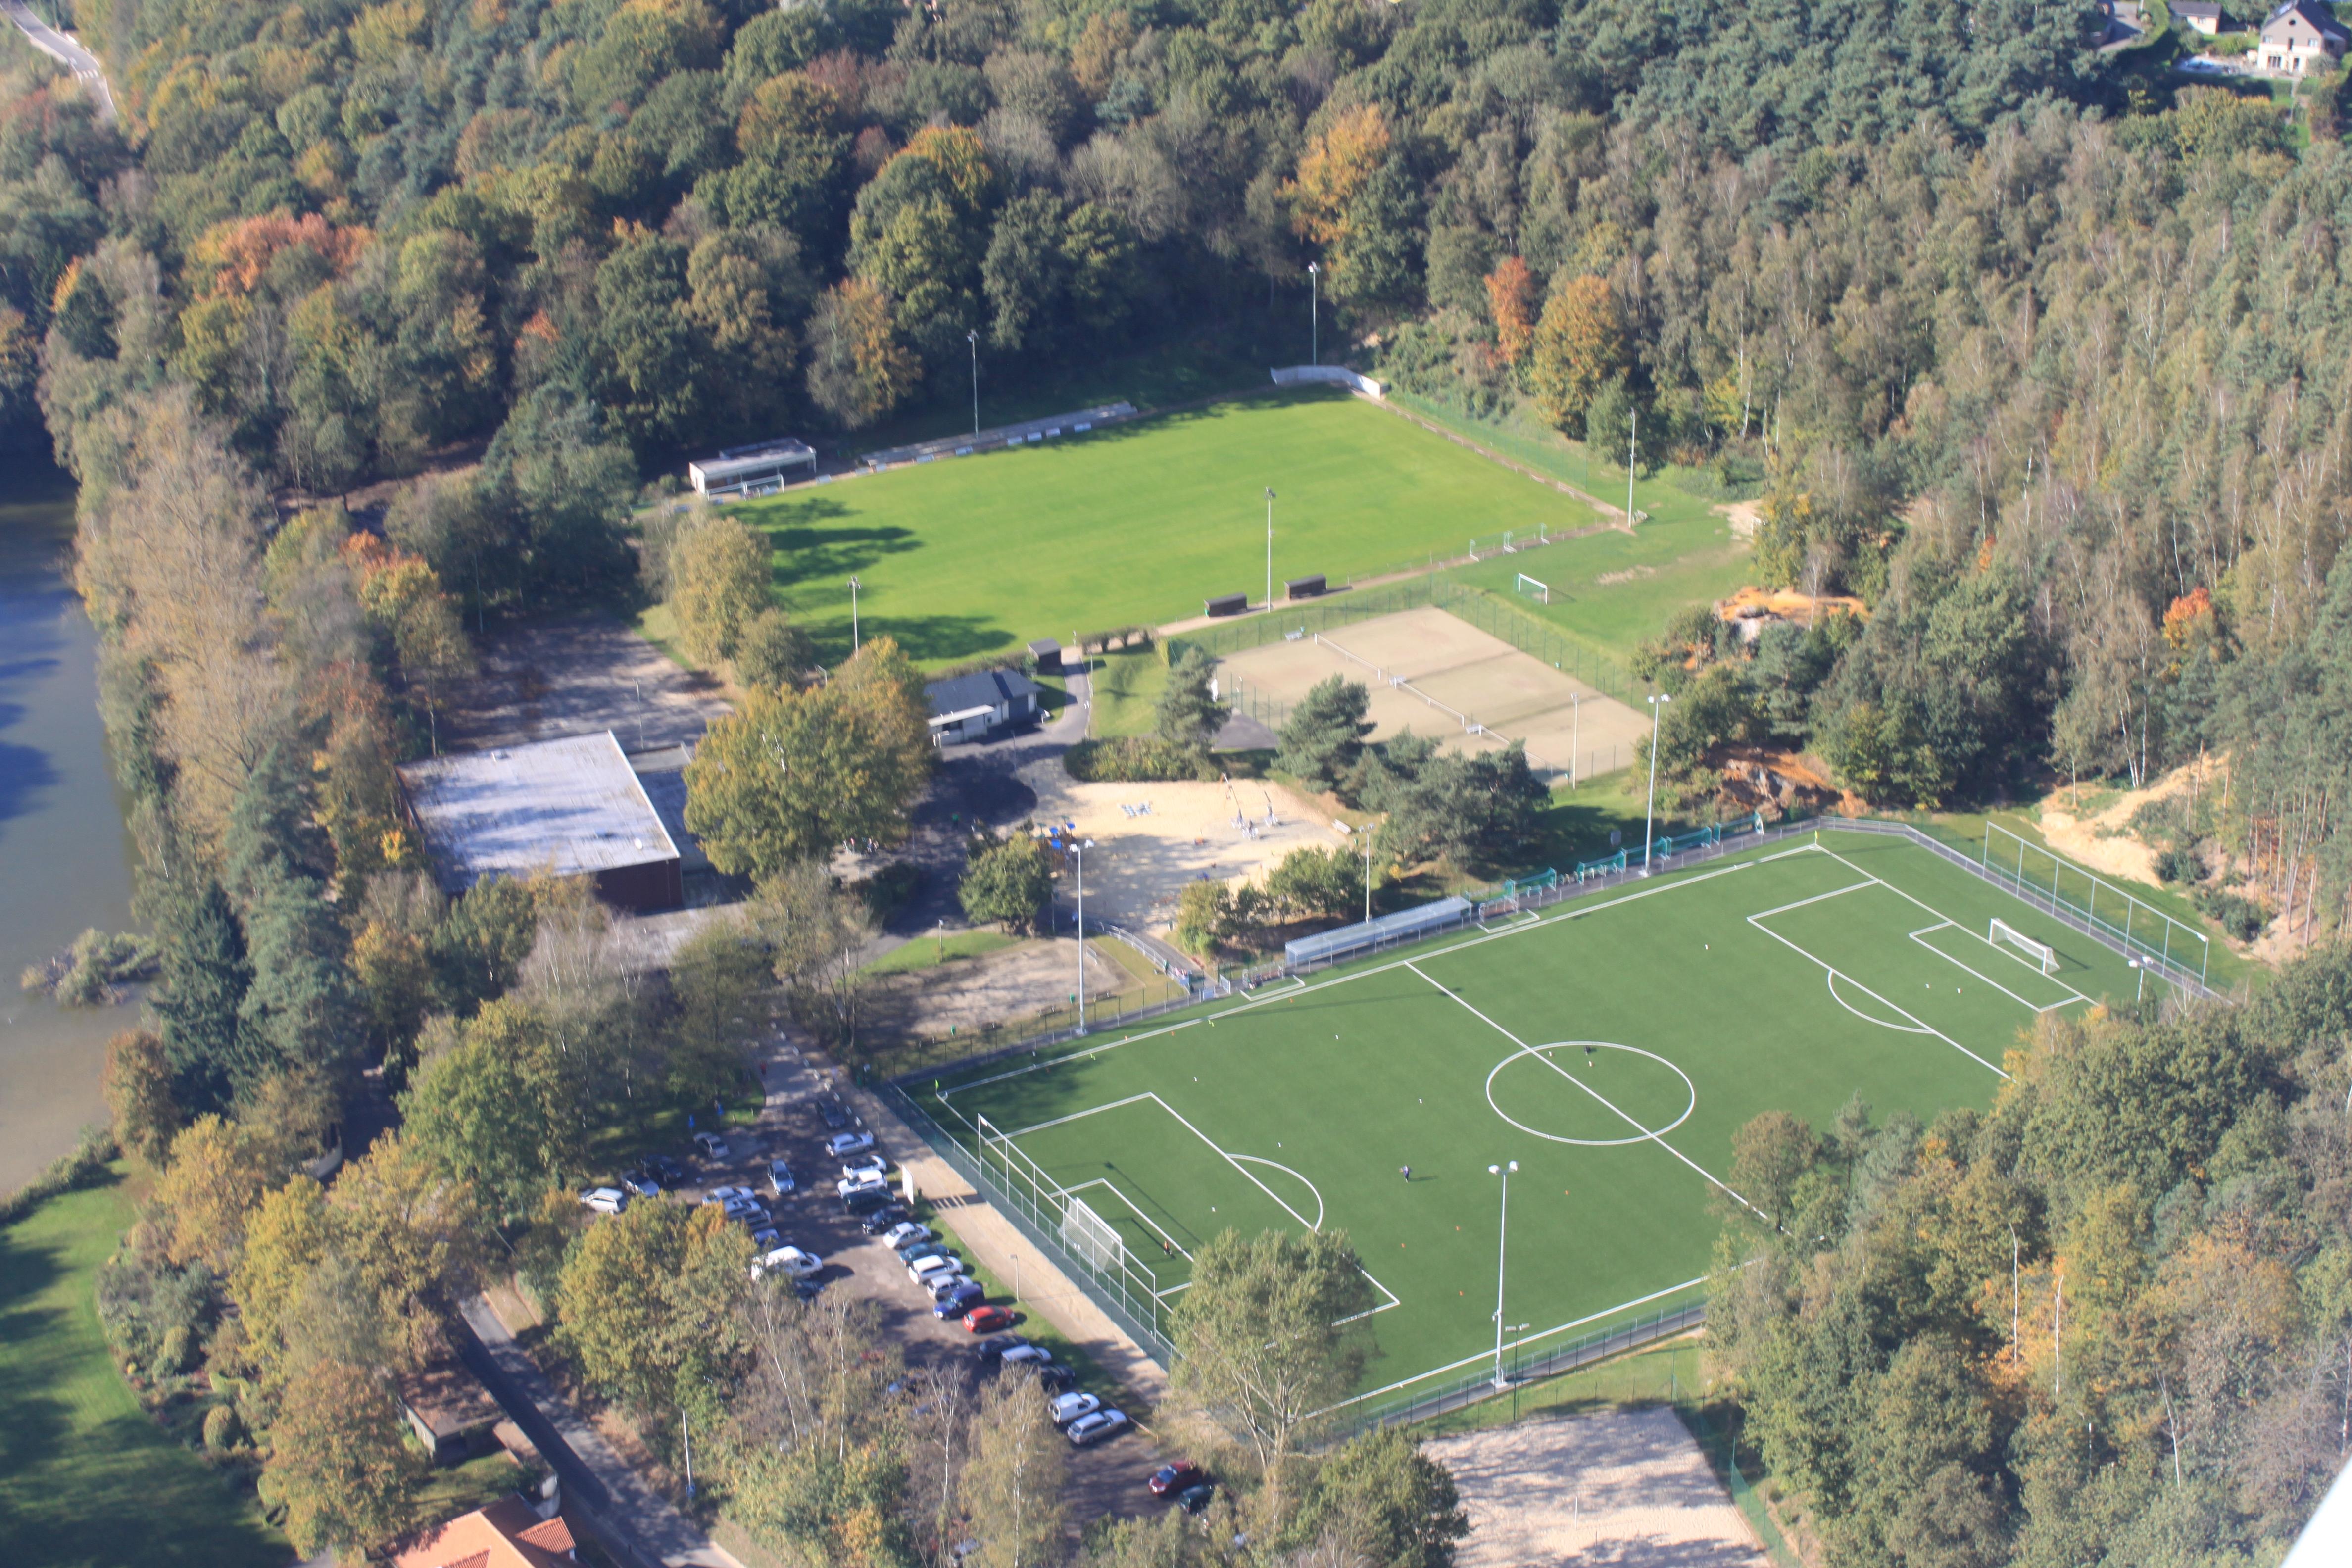 Centre sportif photo aérienne.jpg